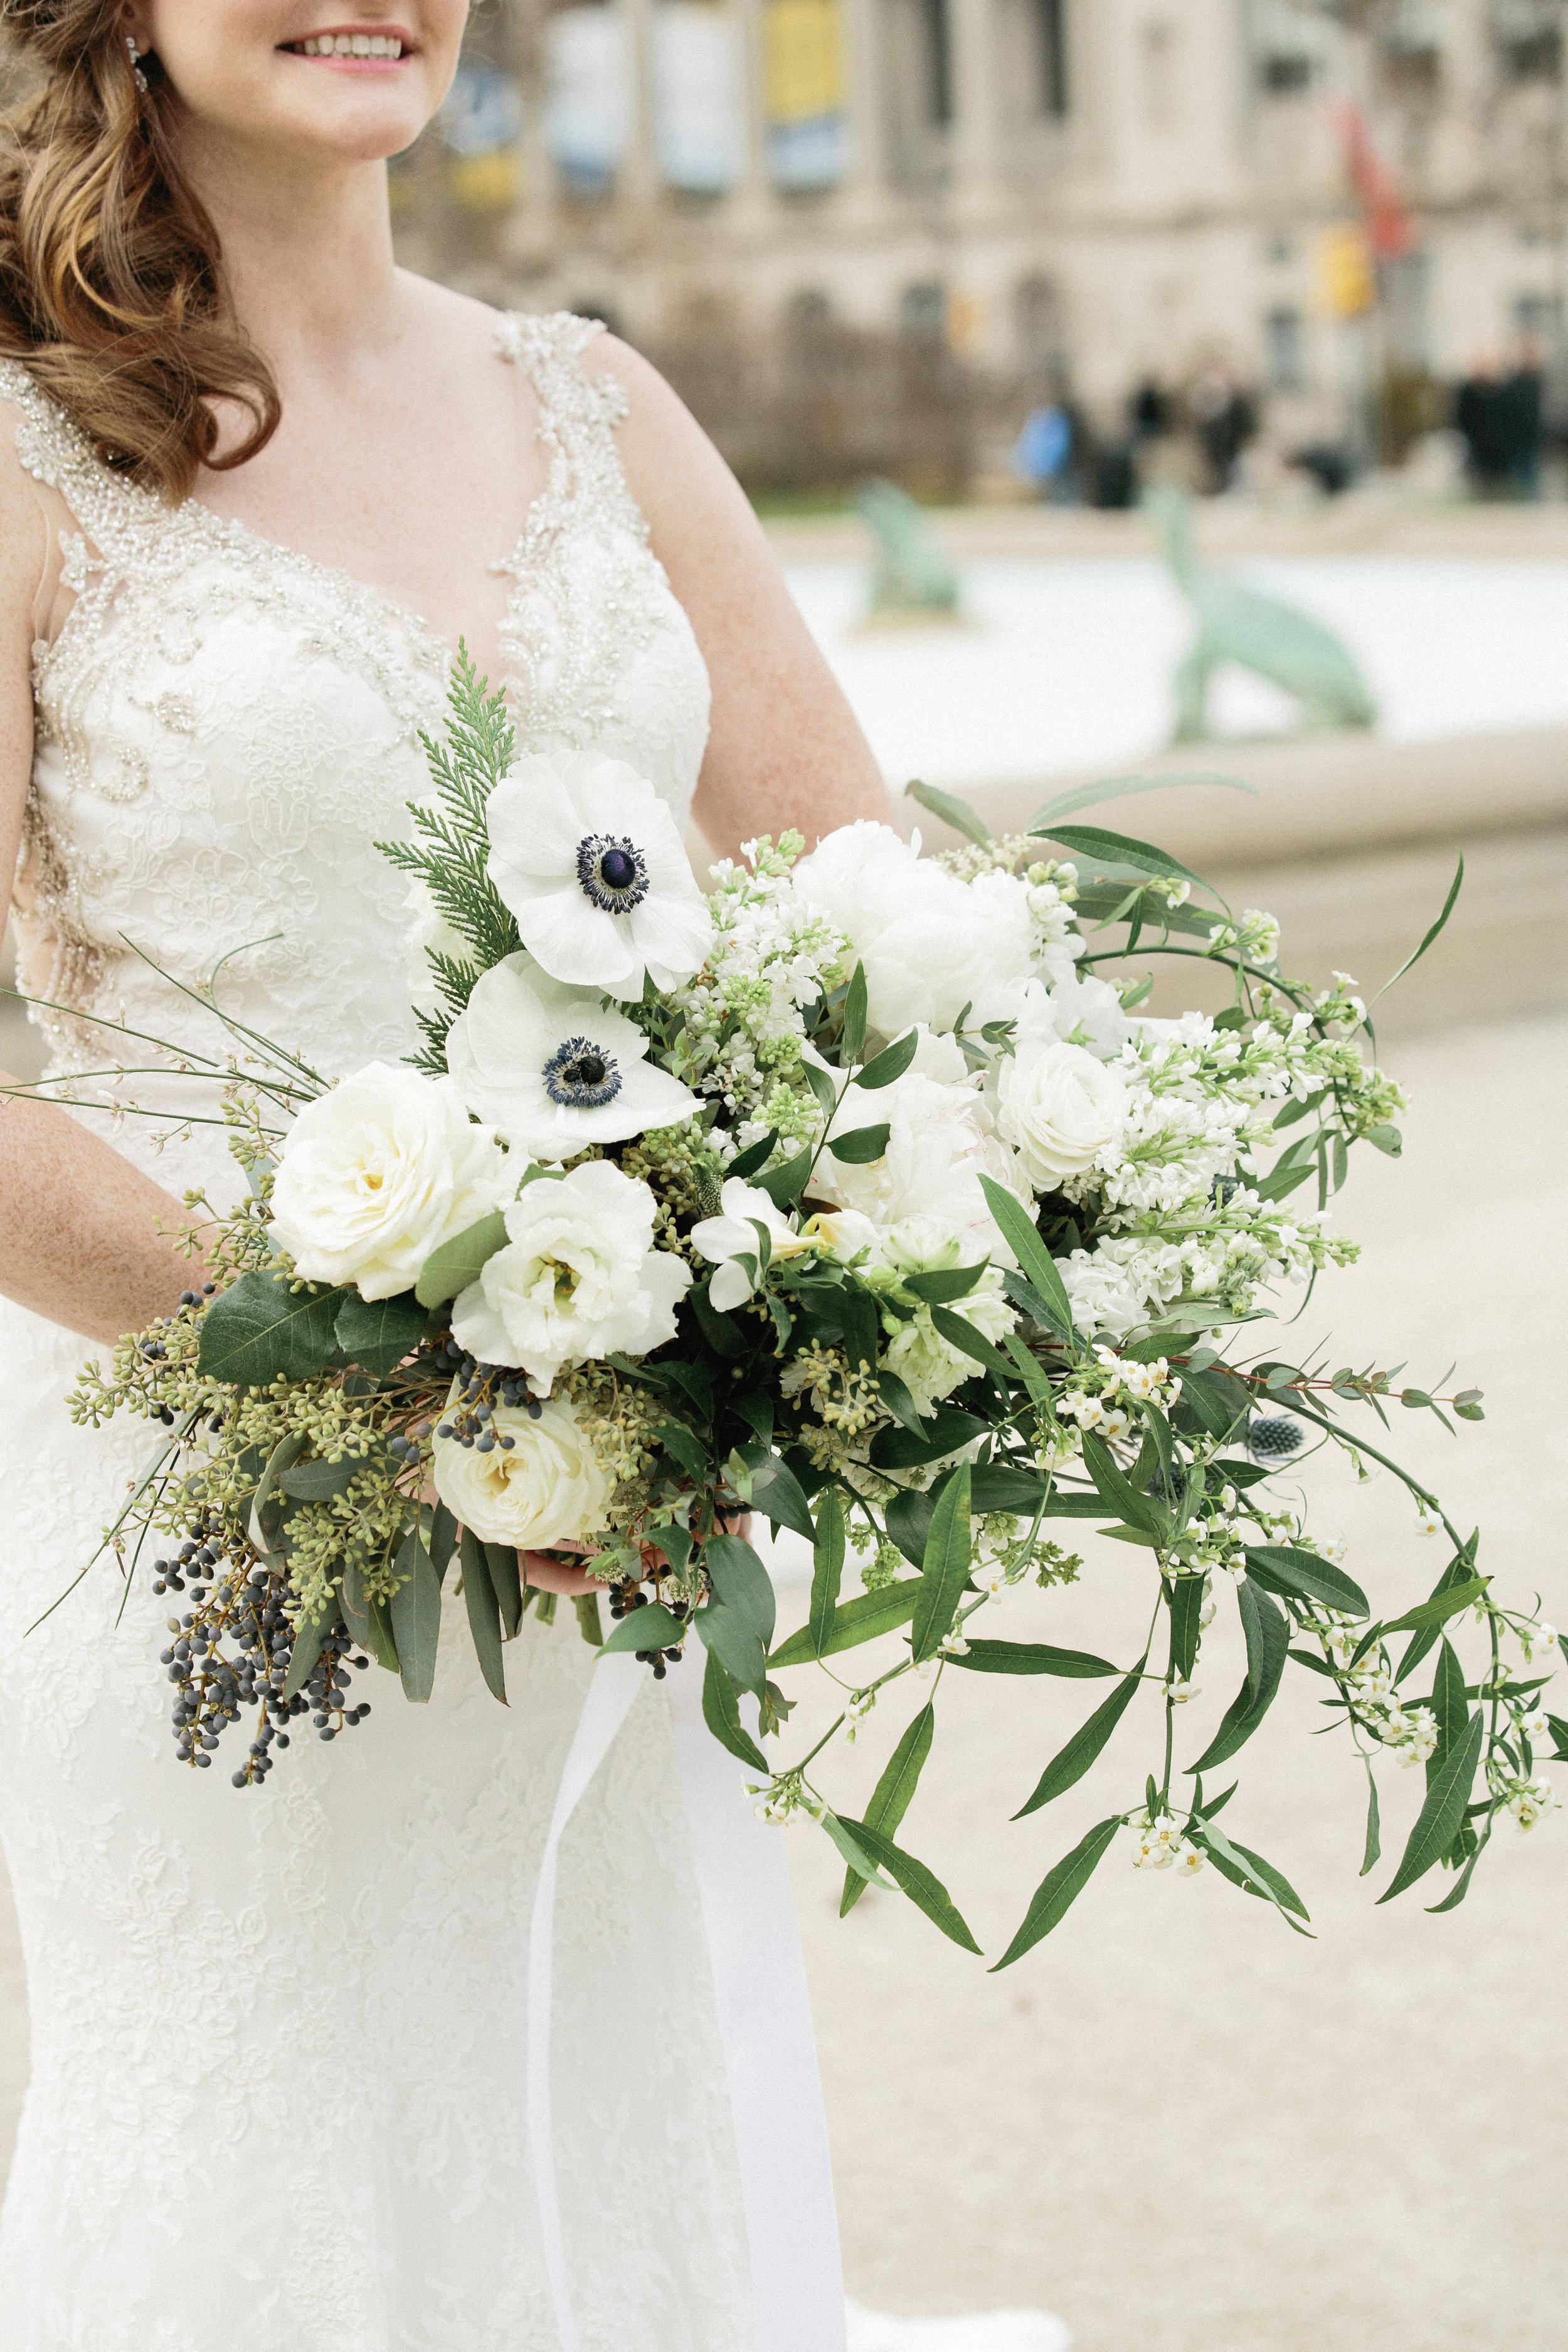 Hudson-Nichols-Martha-Stewart-Weddings-Winter-Ski-Philadelphia-Claire-Conner_069.jpg